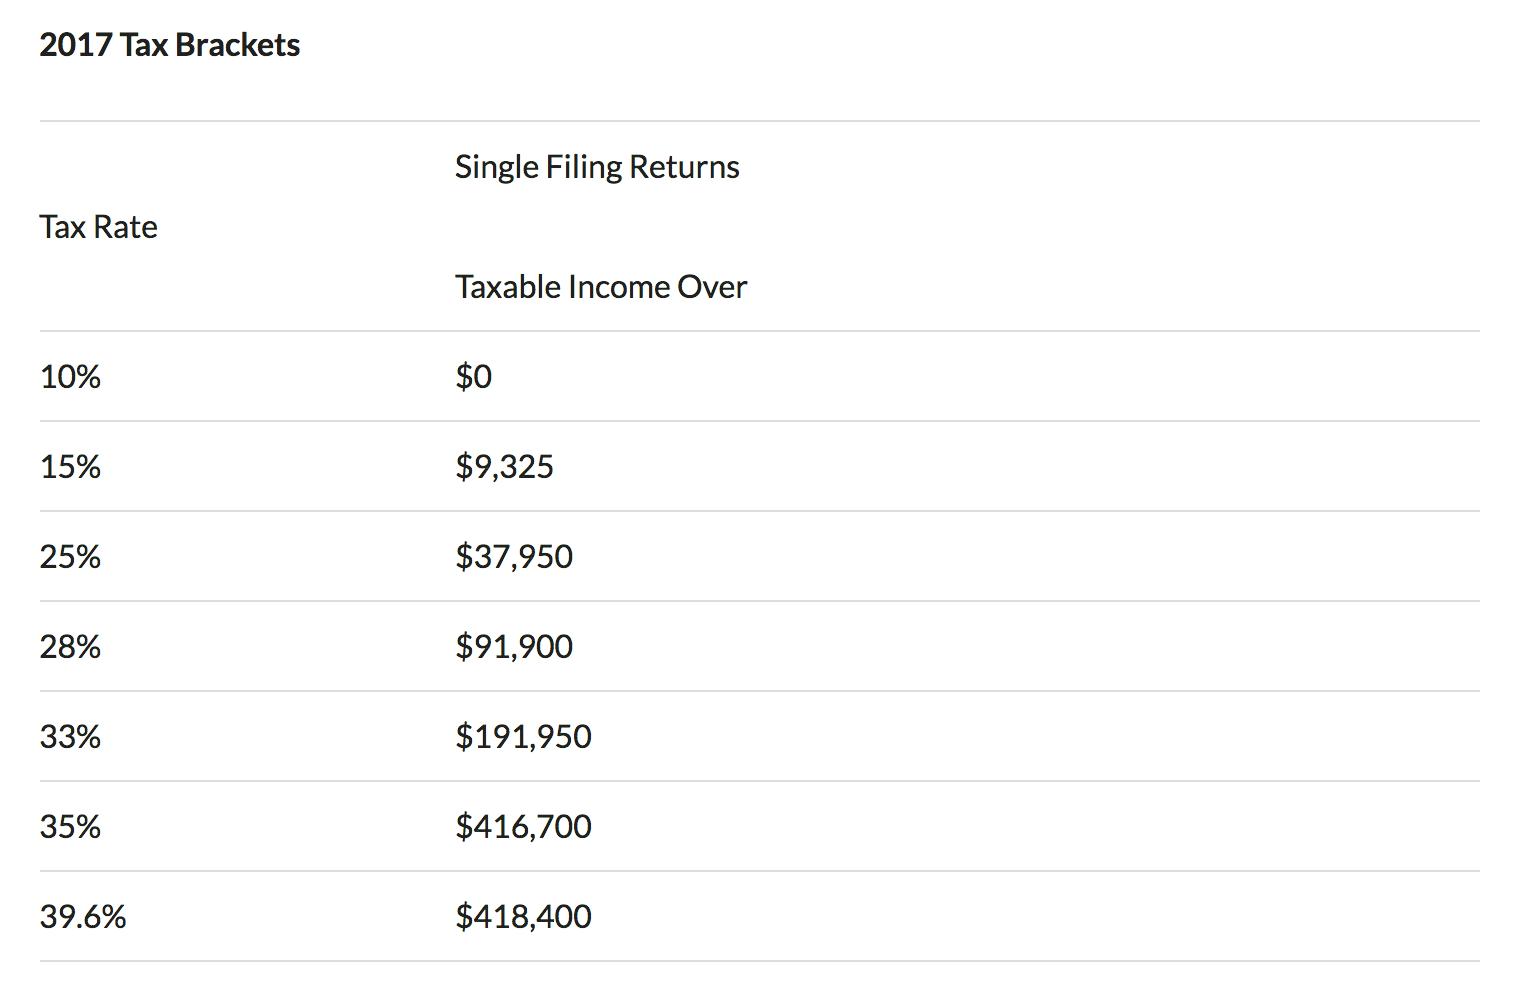 2017 single filing returns tax bracket